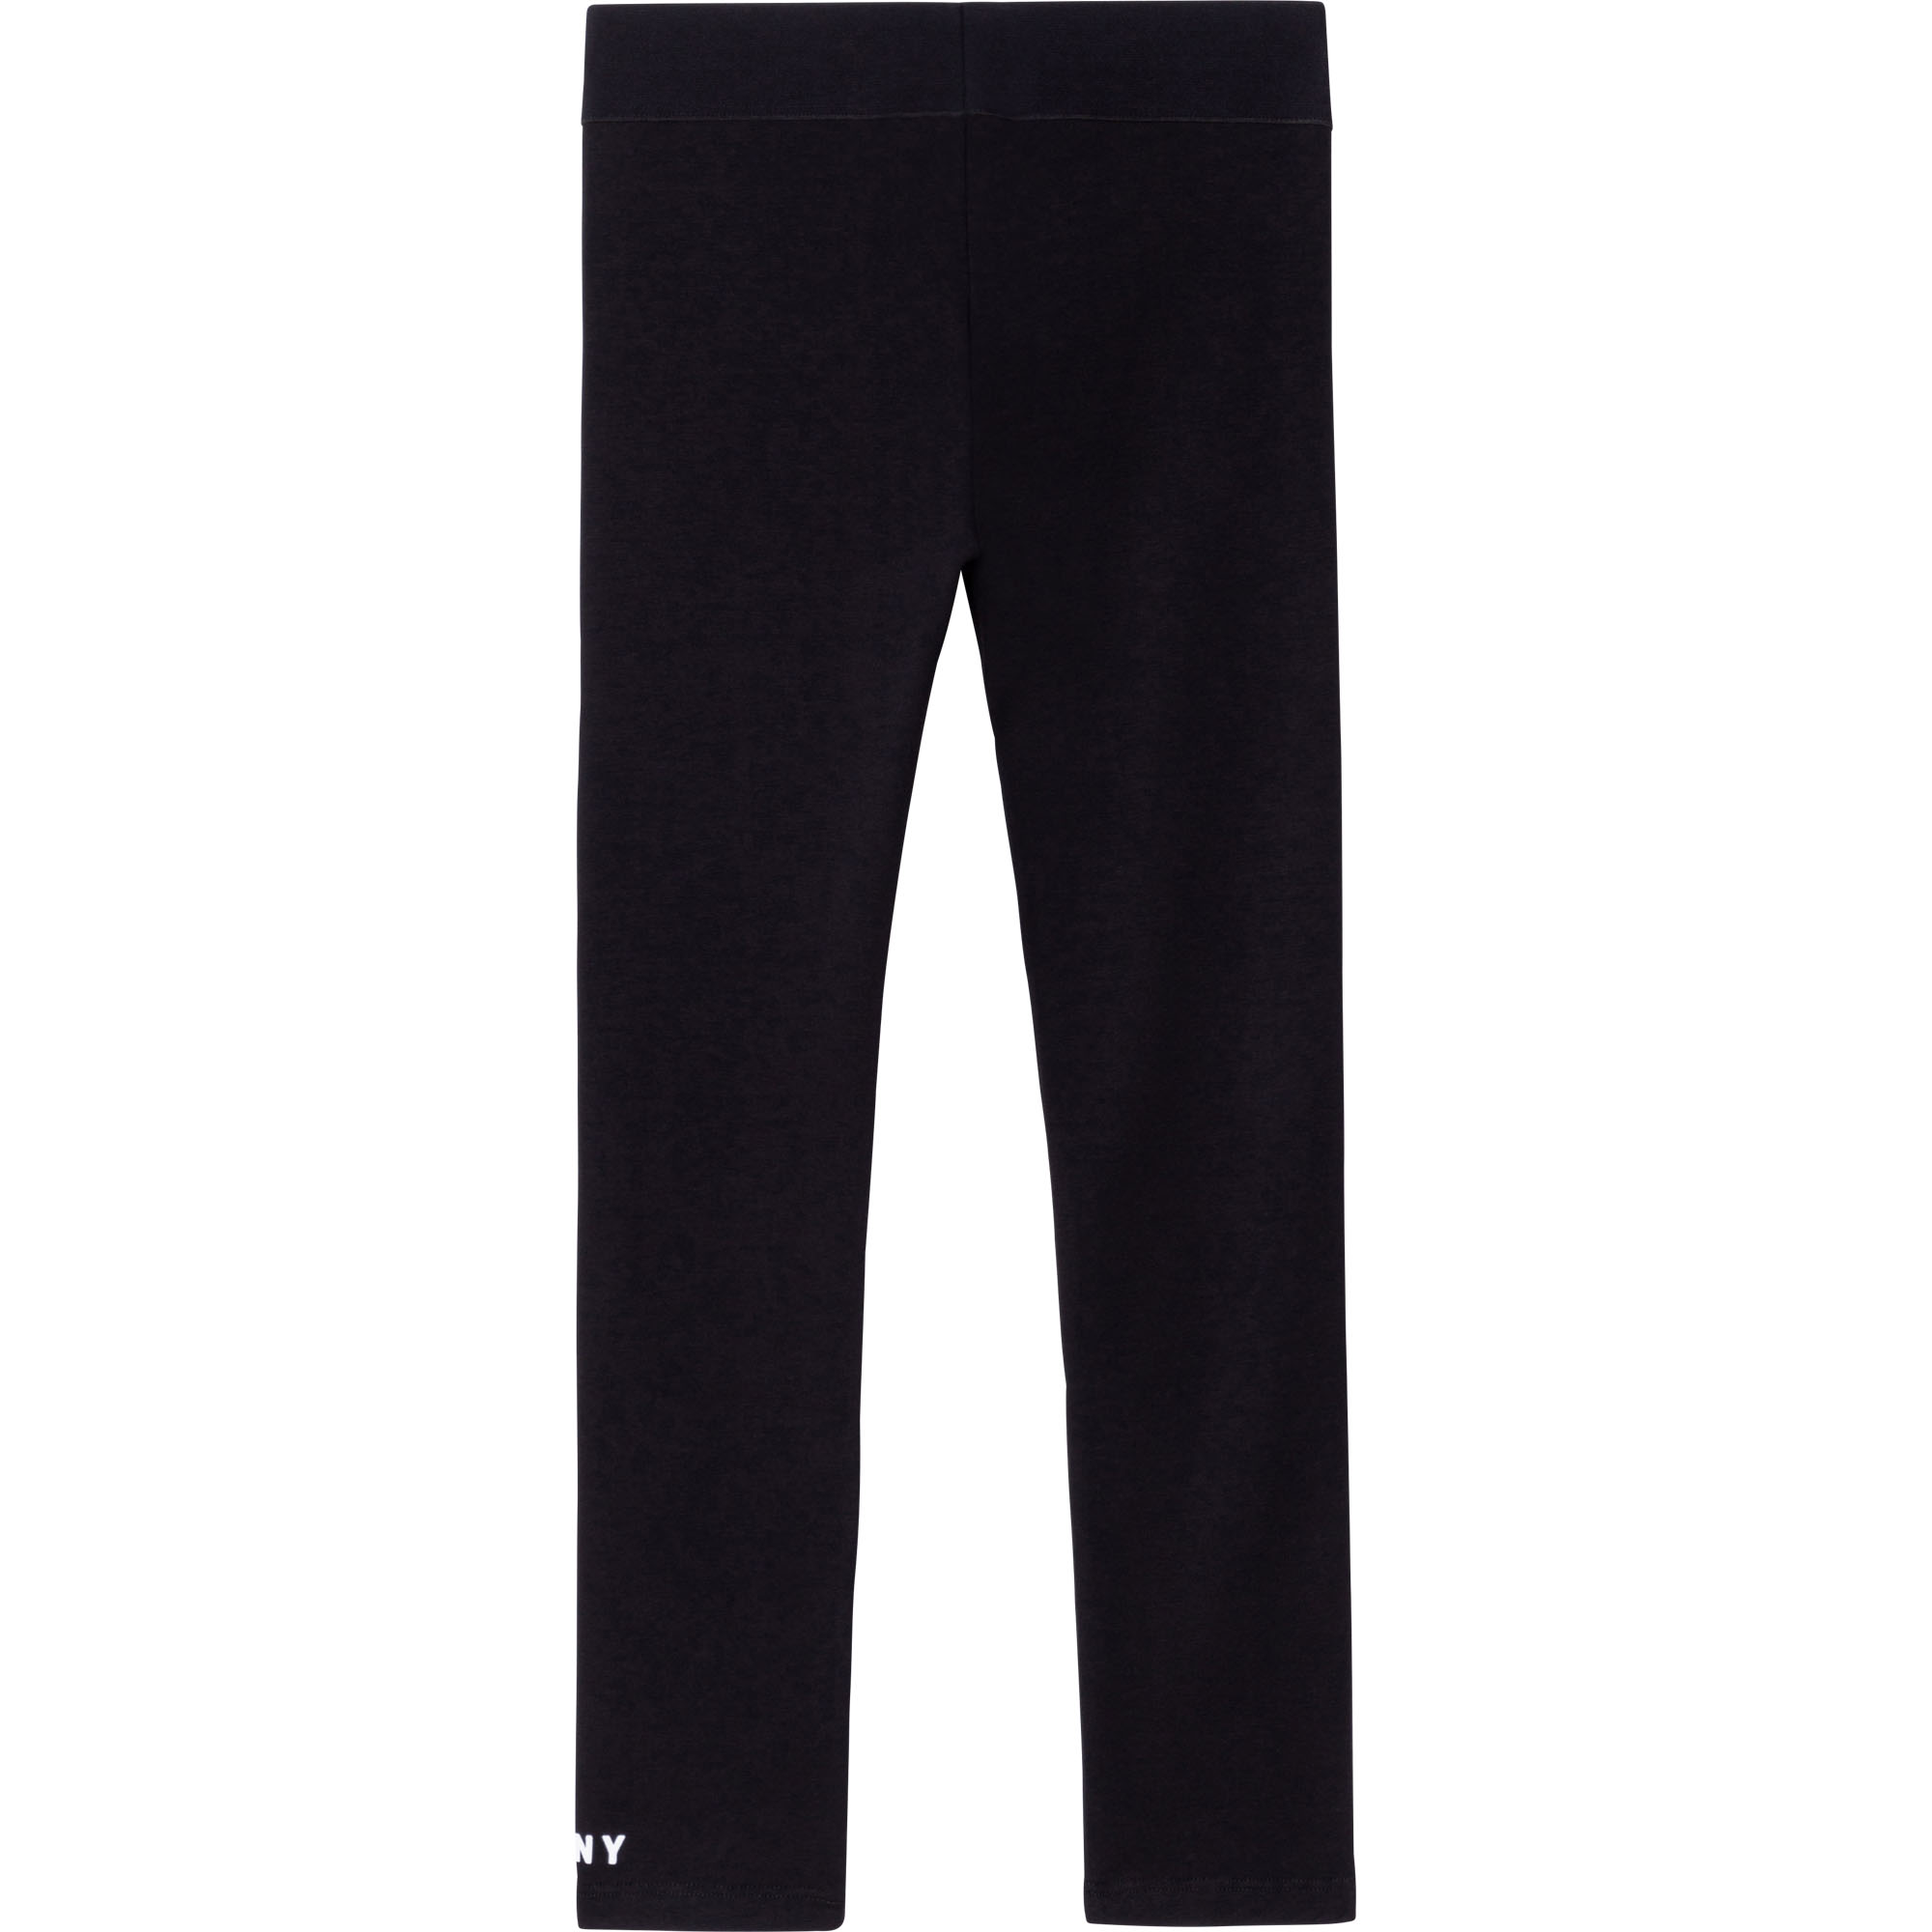 Legging coton bio avec logo DKNY pour FILLE